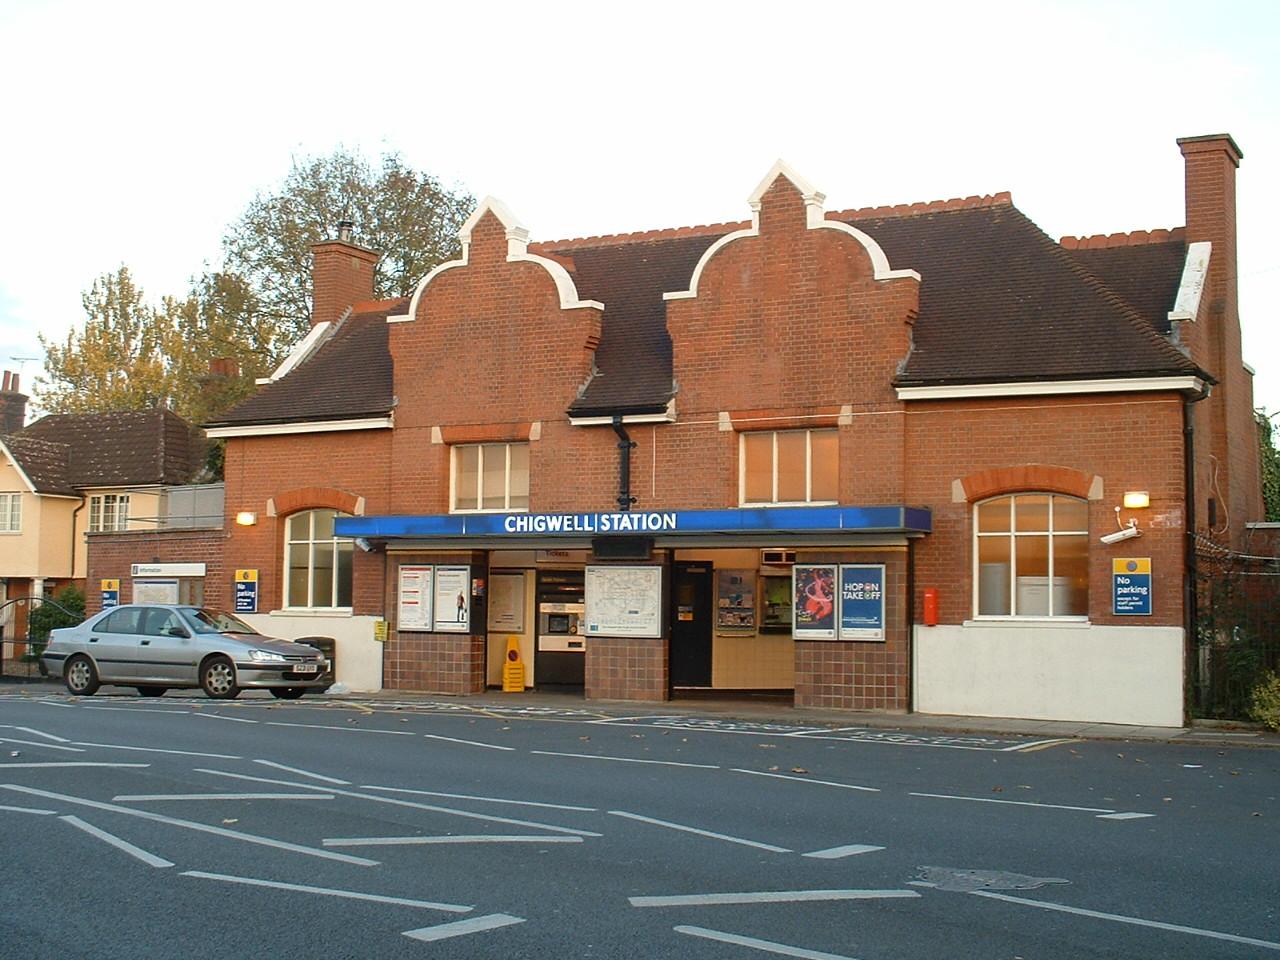 Chigwell (metrostation)